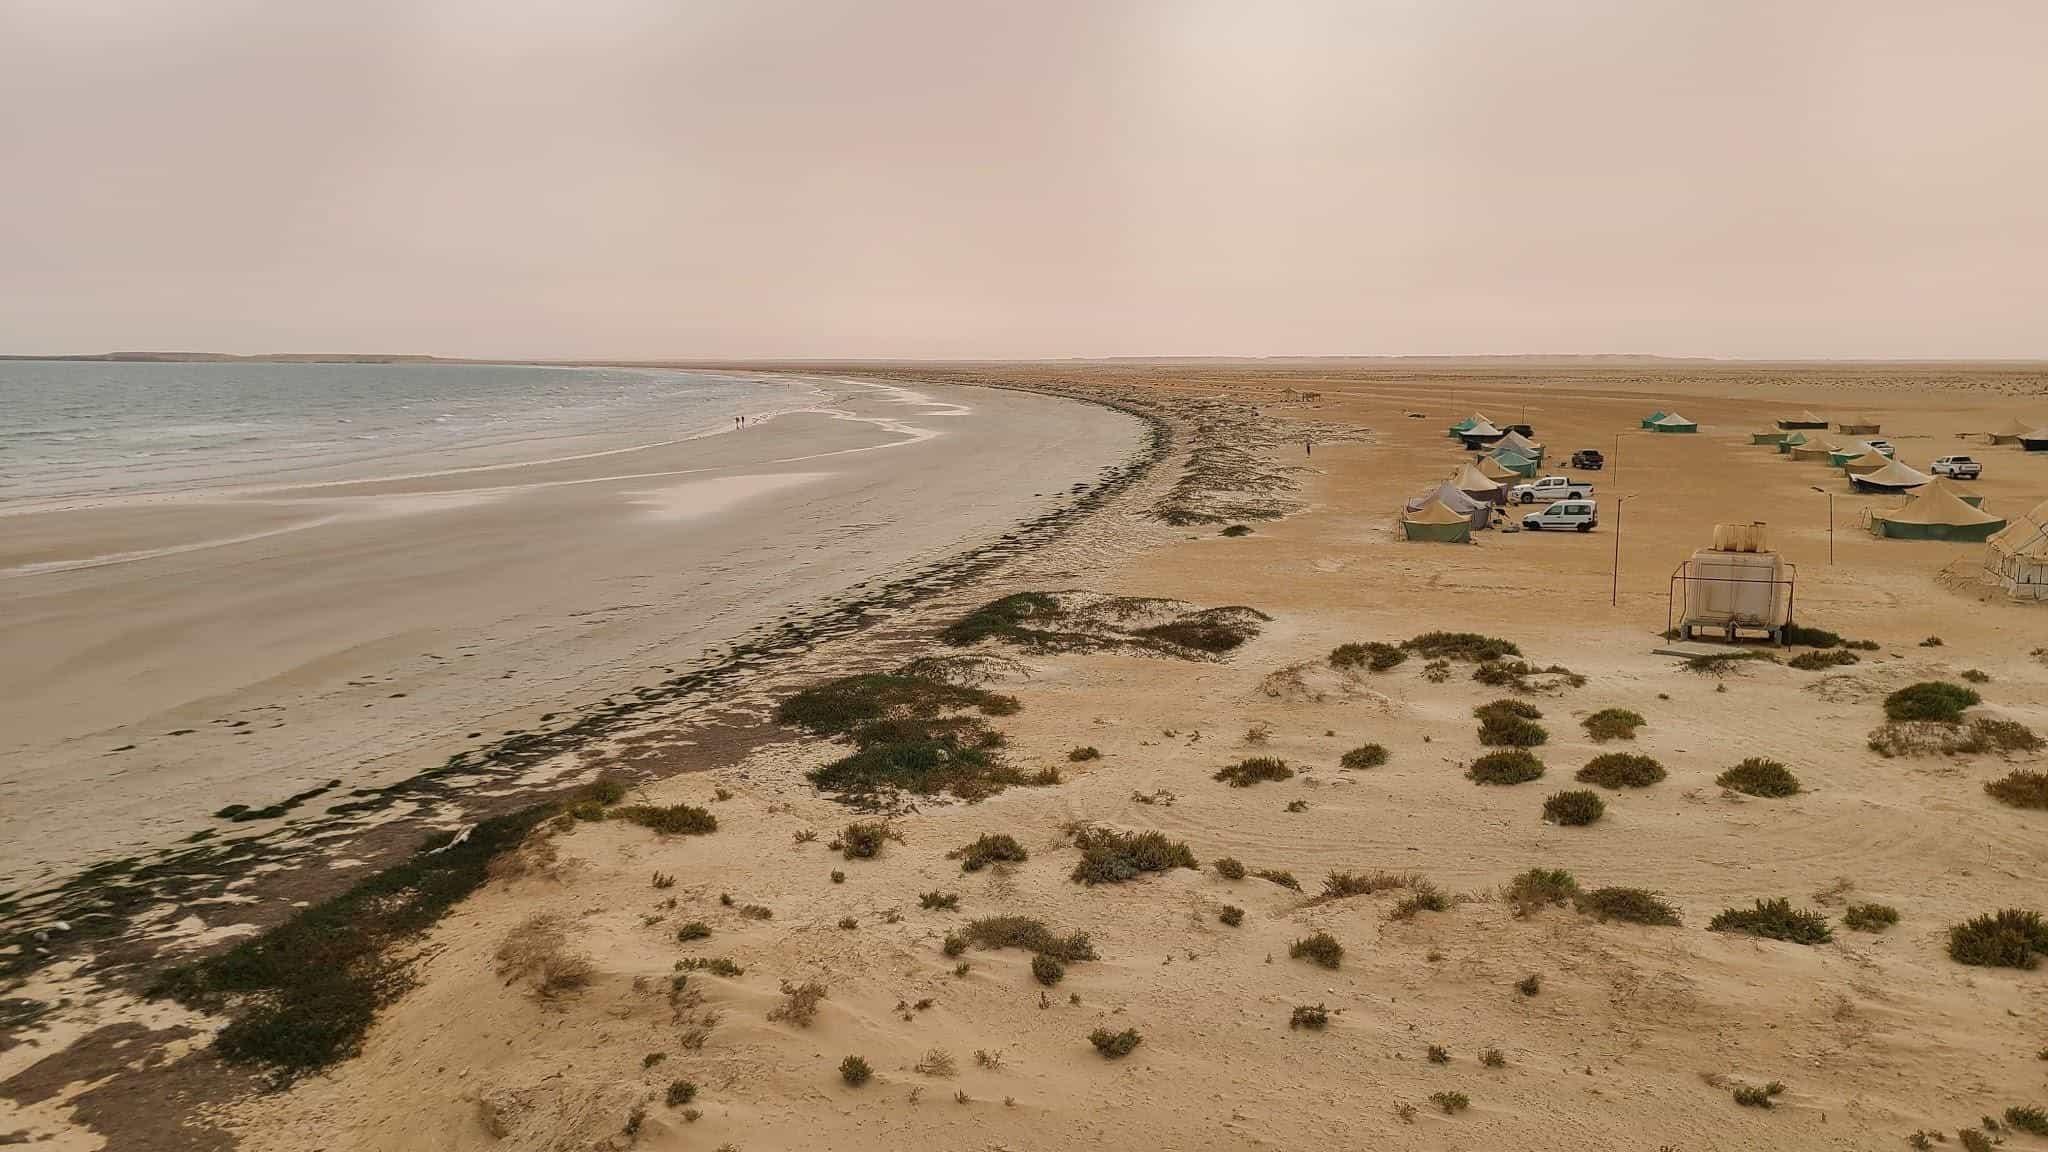 Cape Arkeiss Camp